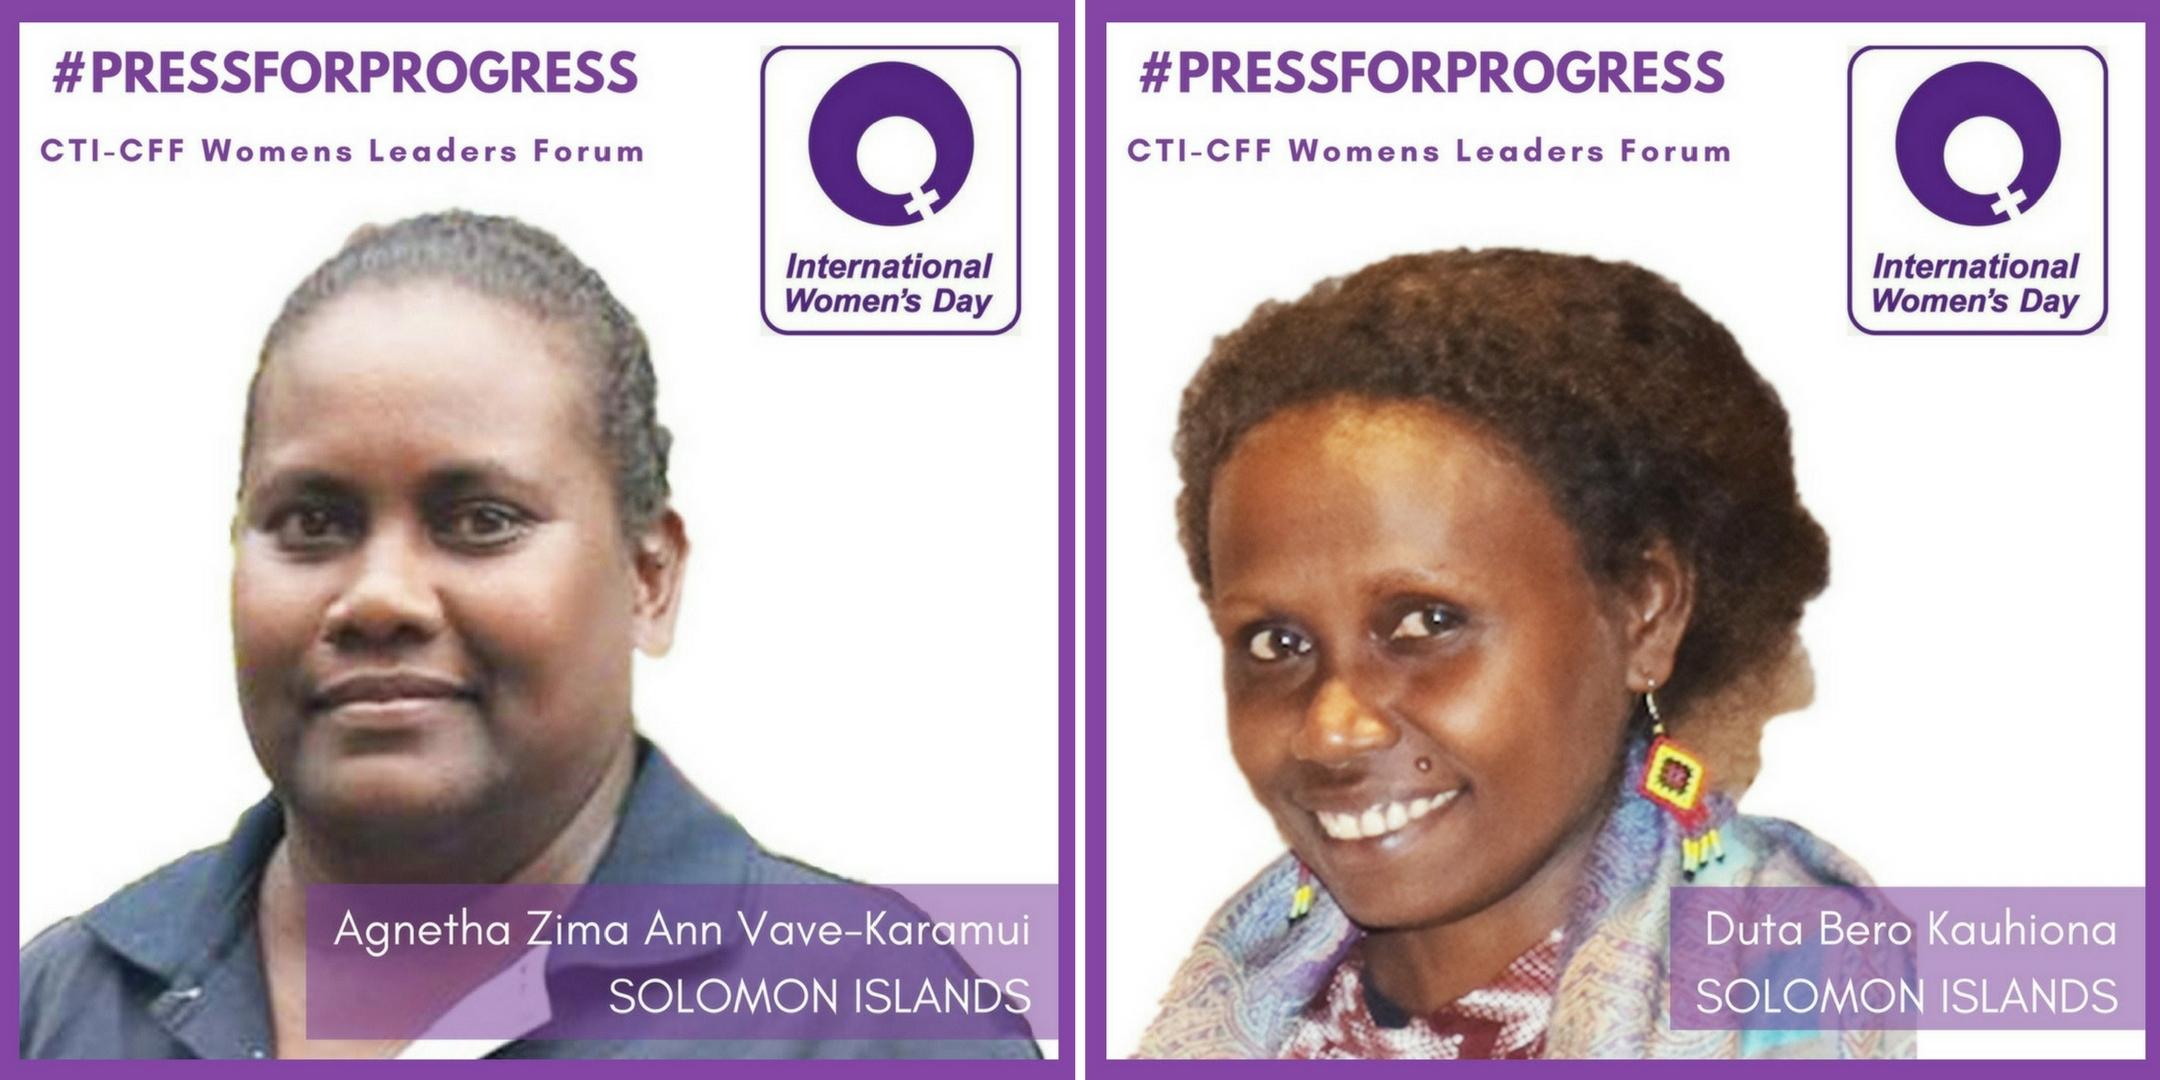 WLF profiles Agnetha and Duta Solomon Islands